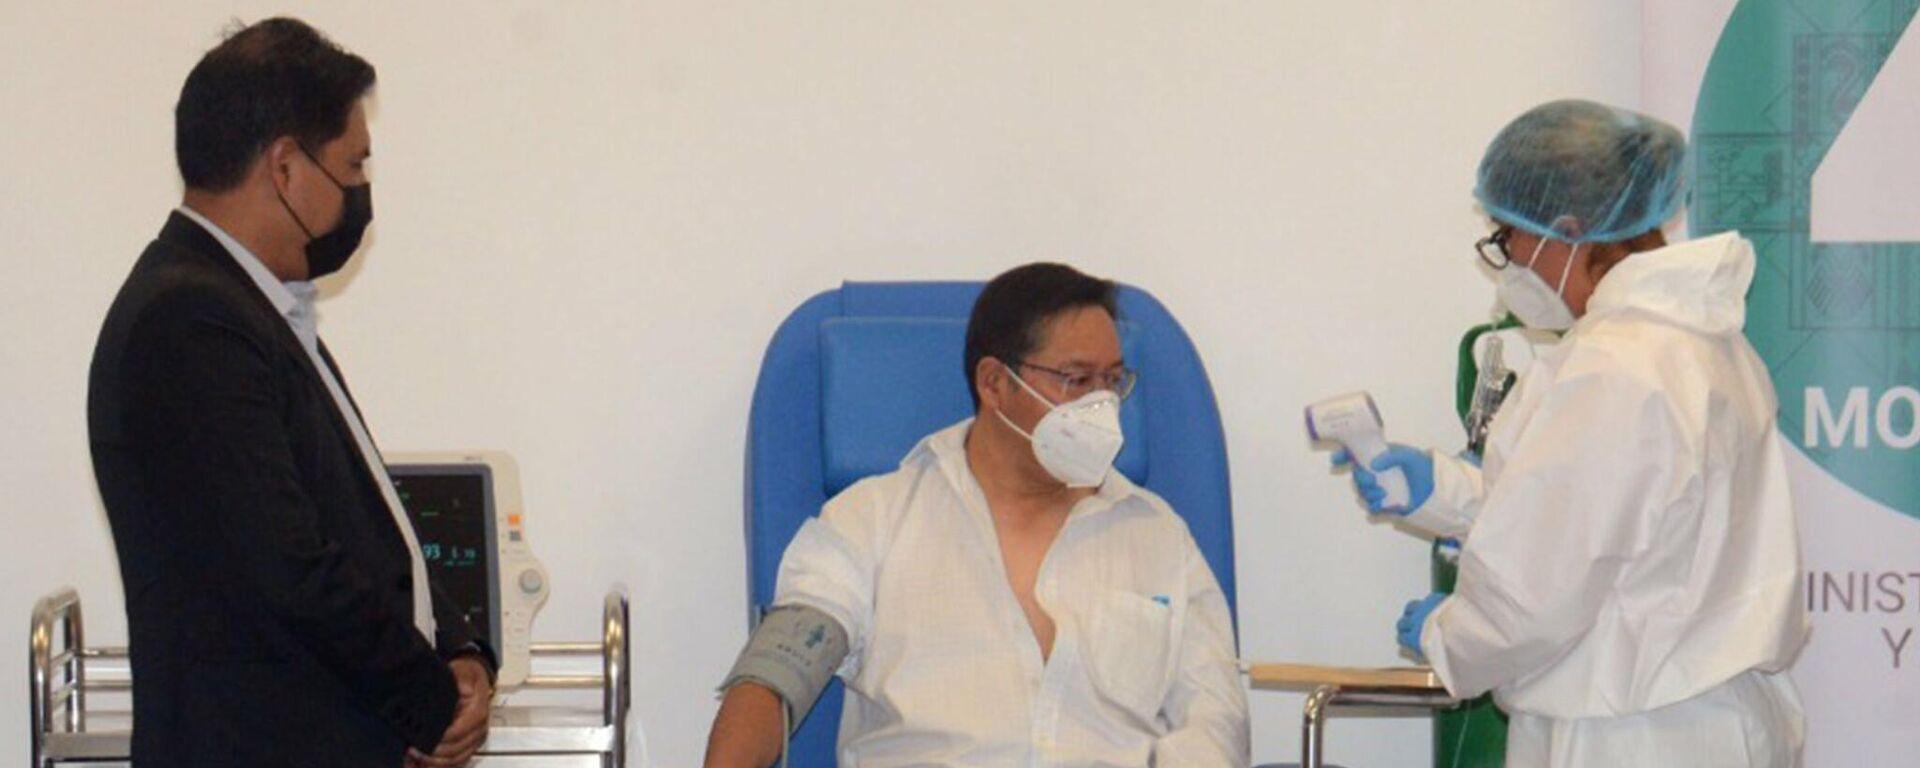 El presidente de Bolivia, Luis Arce, recibe la primera dosis de la vacuna Sputnik V - Sputnik Mundo, 1920, 02.09.2021